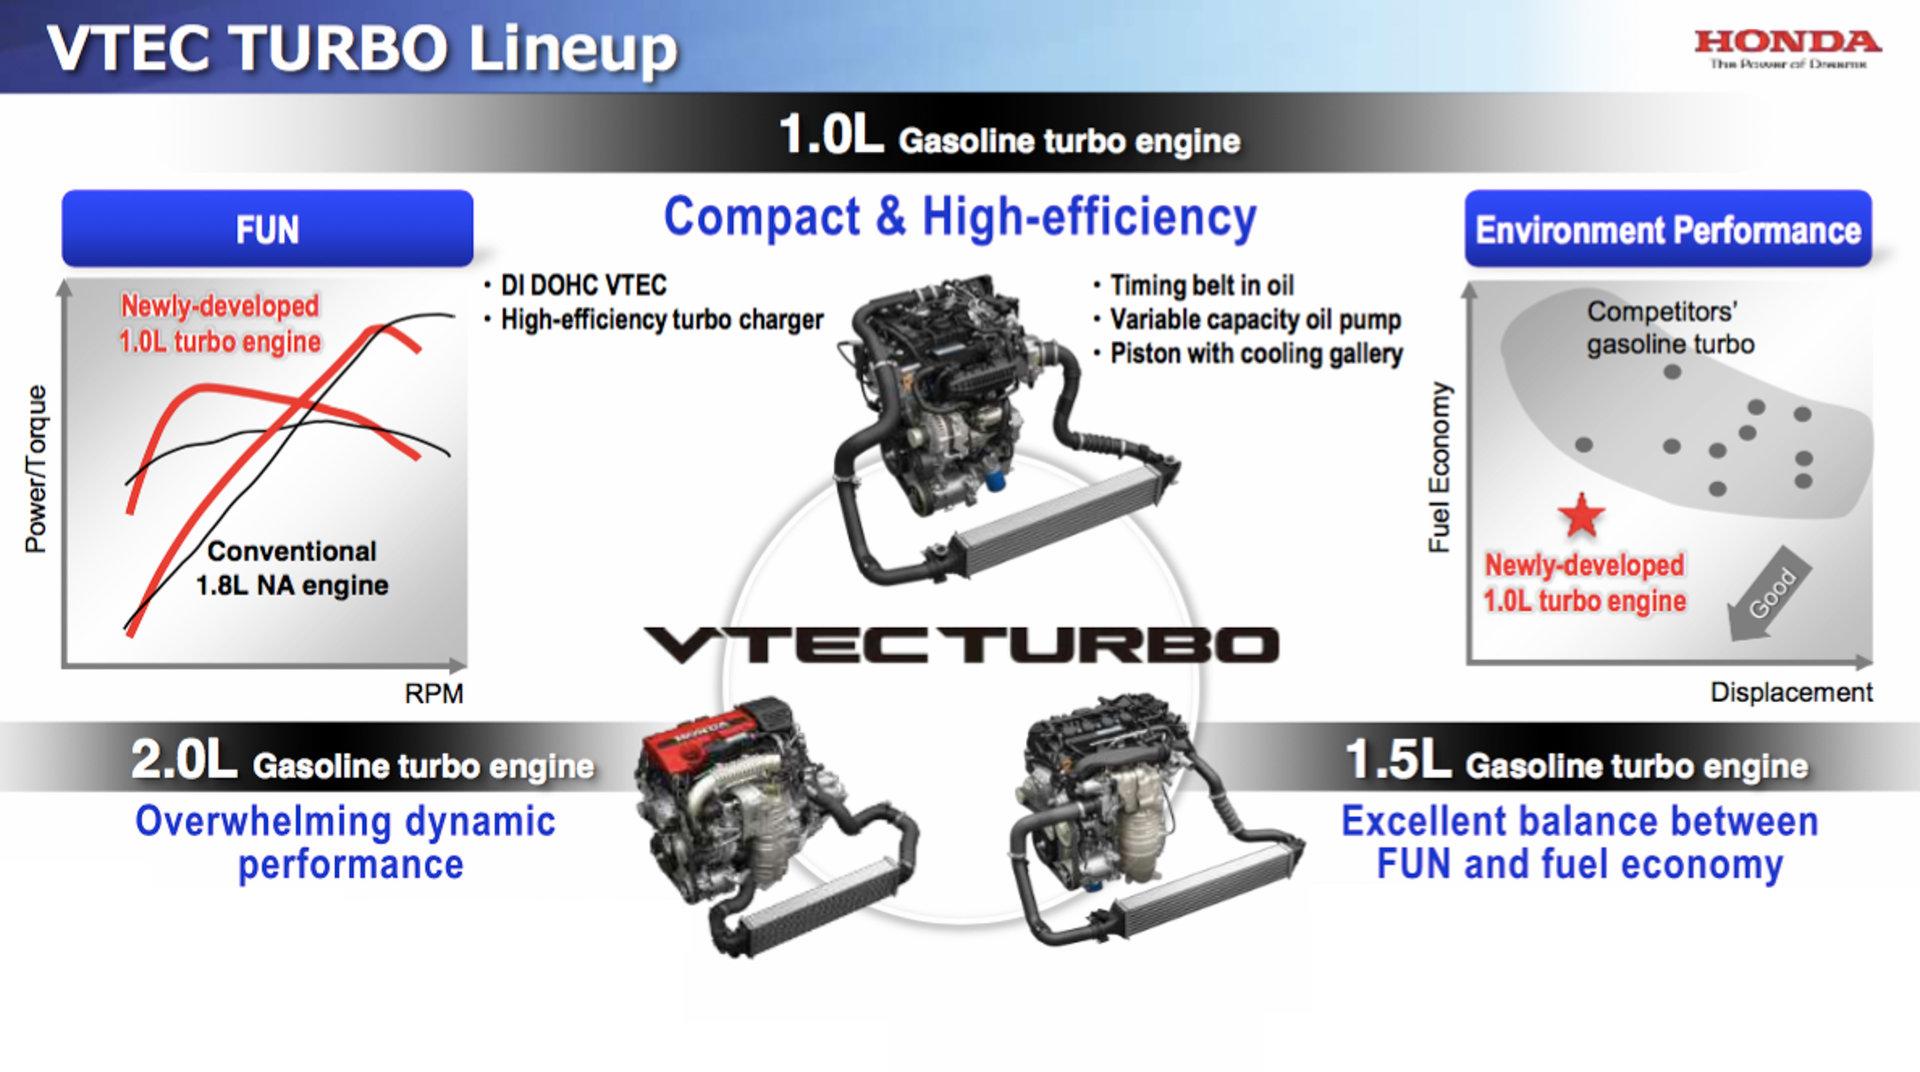 Motor Honda Earth Dreams VTEC Turbo